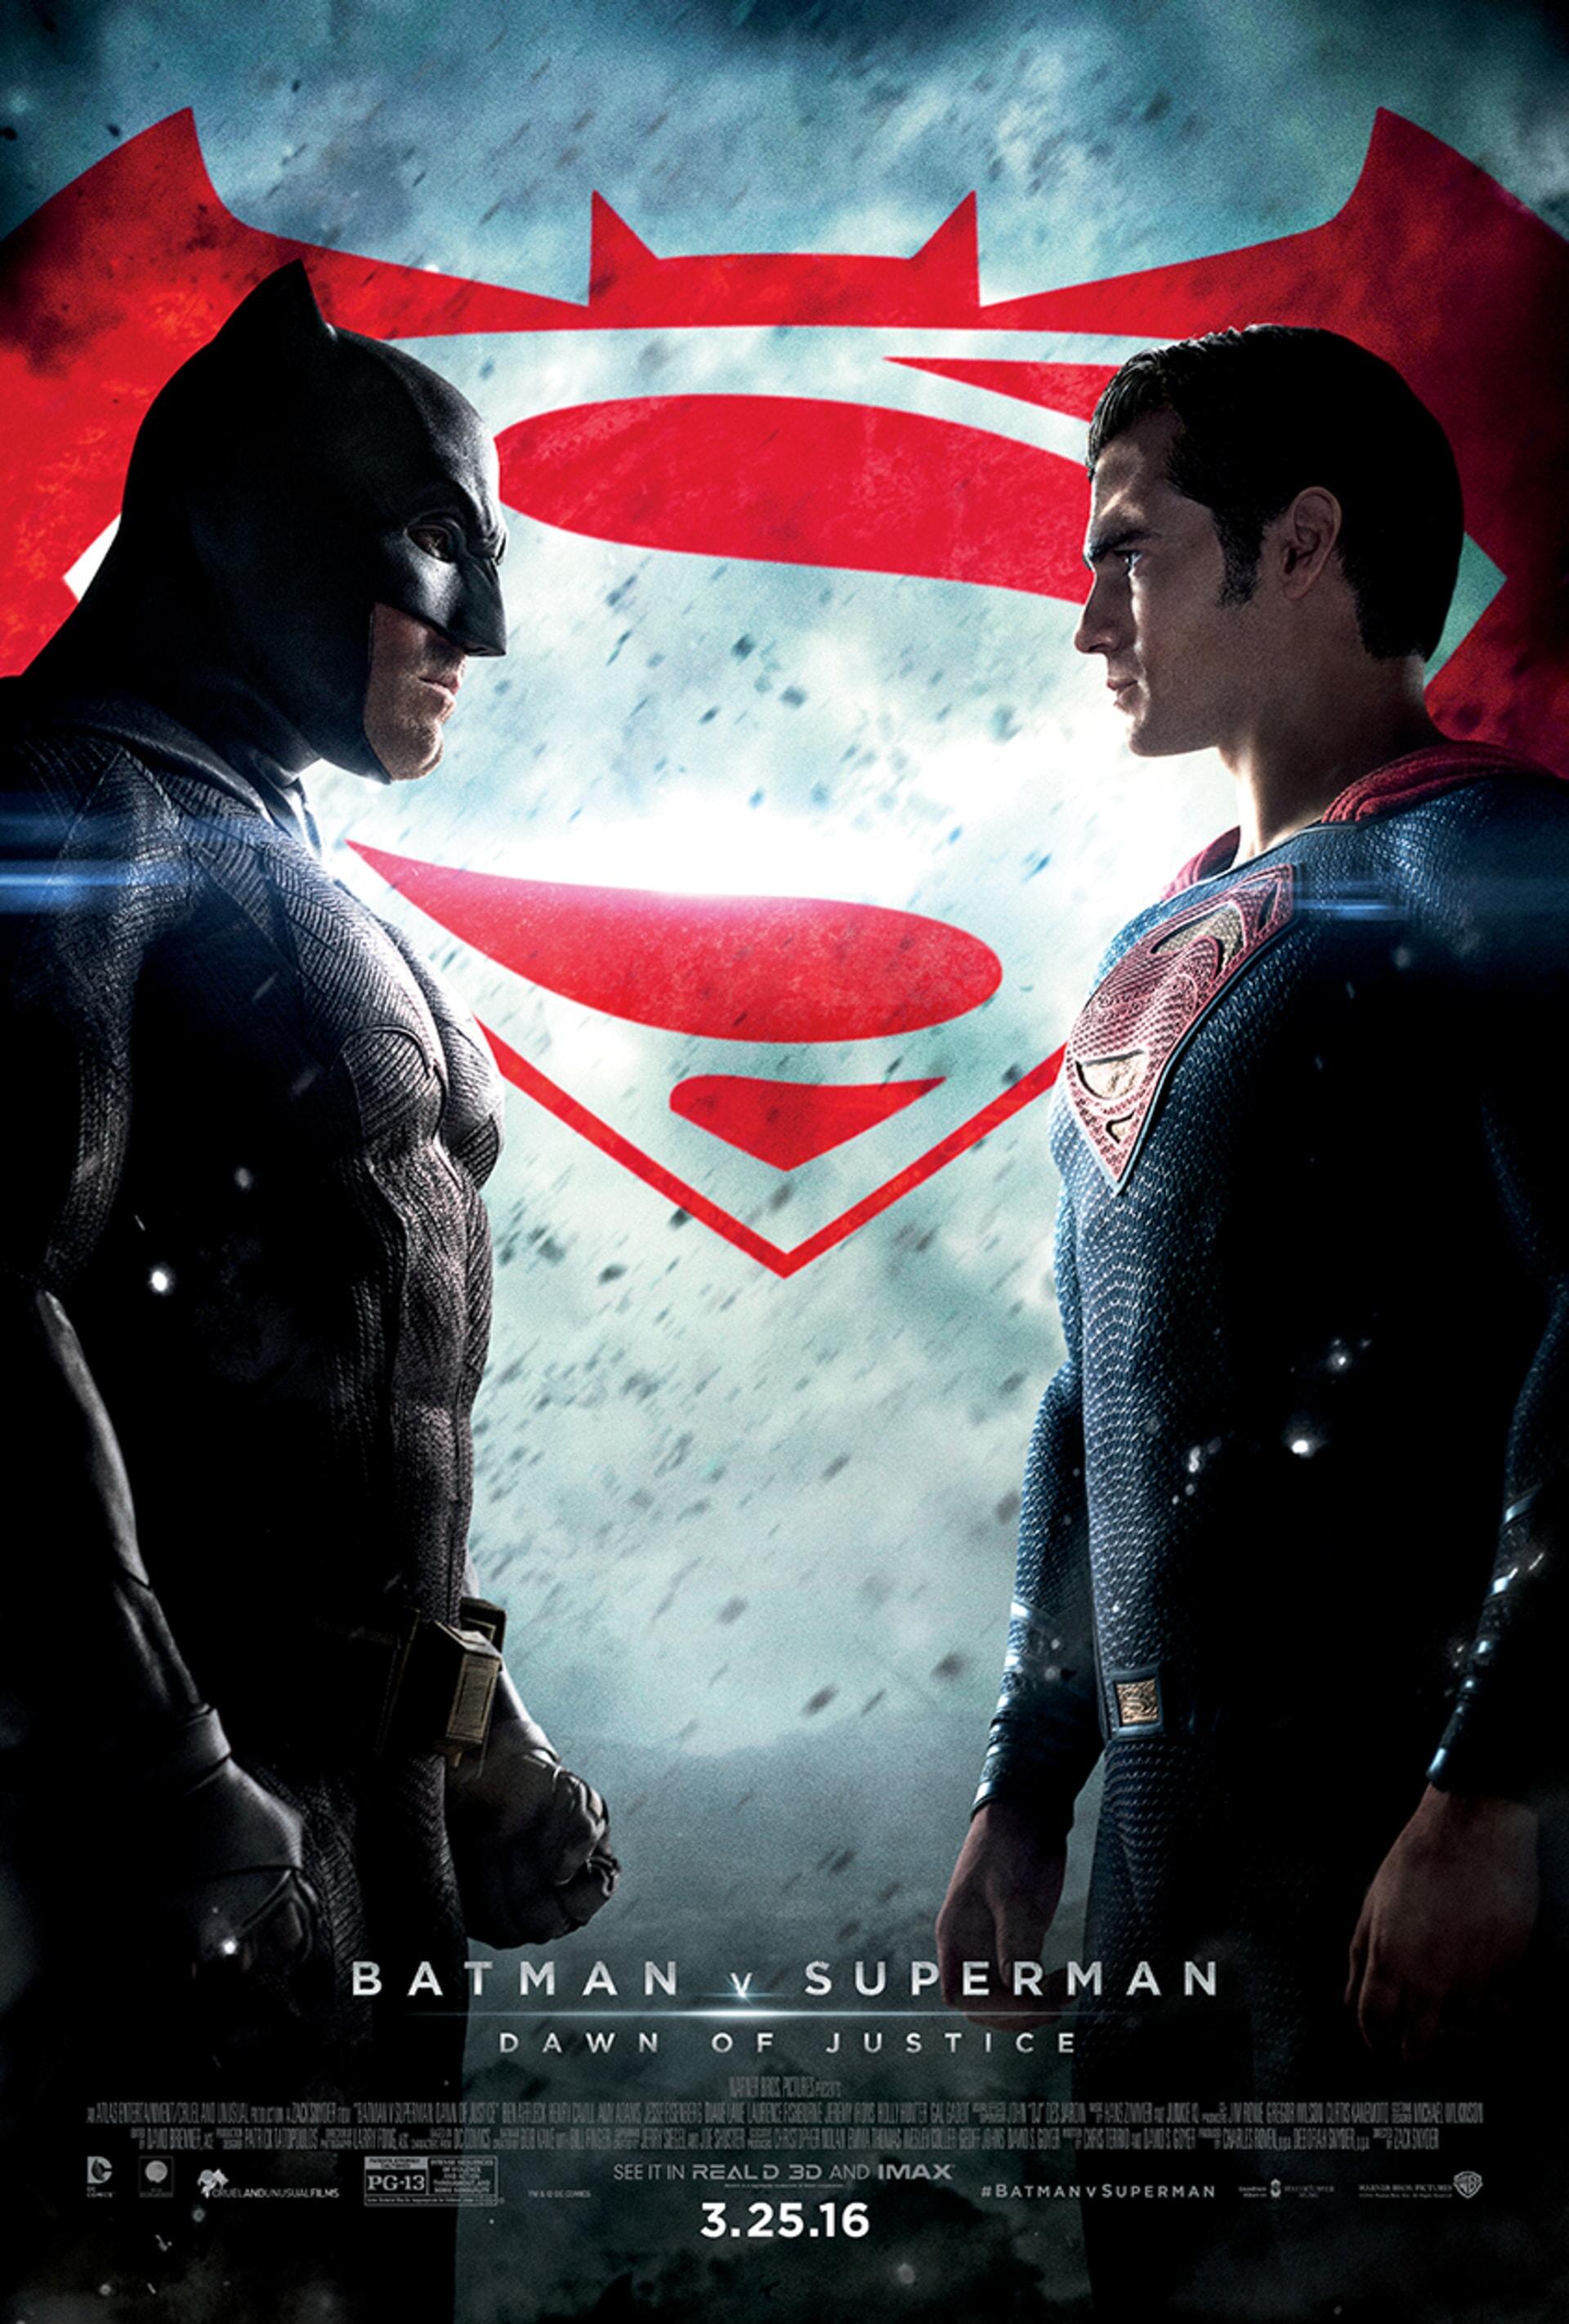 Batman v Superman final face off poster